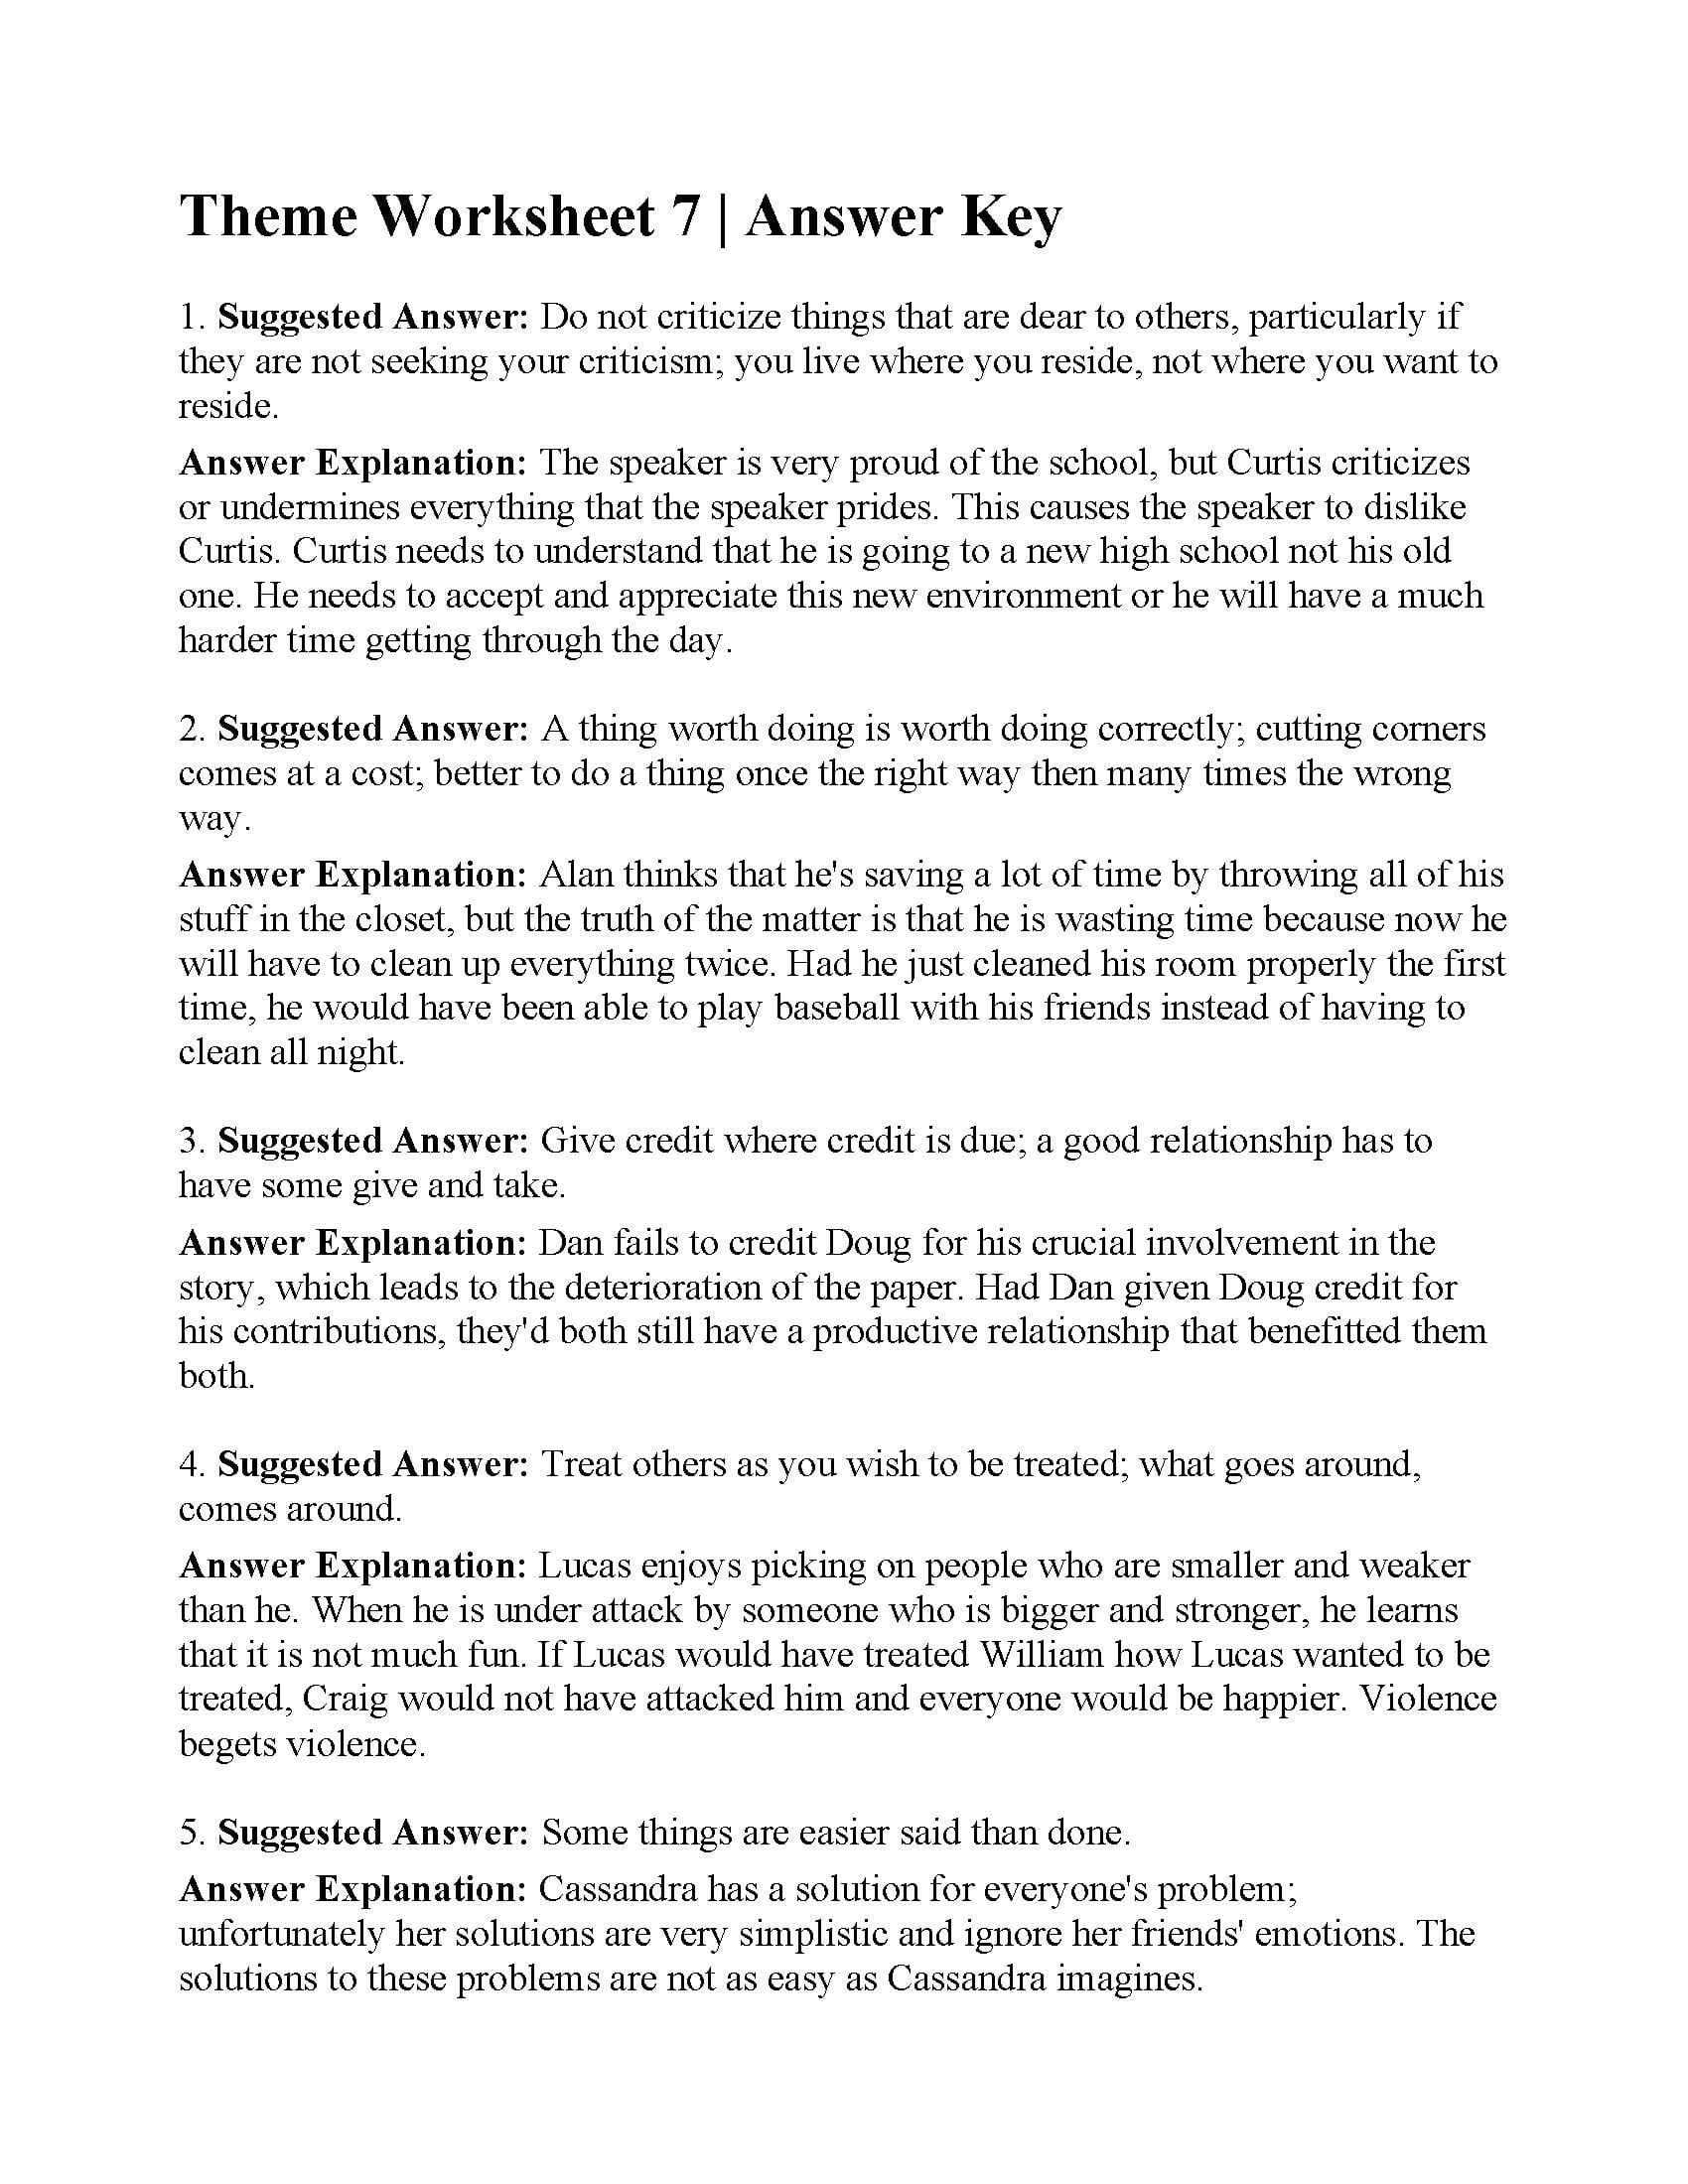 Theme Worksheet 4